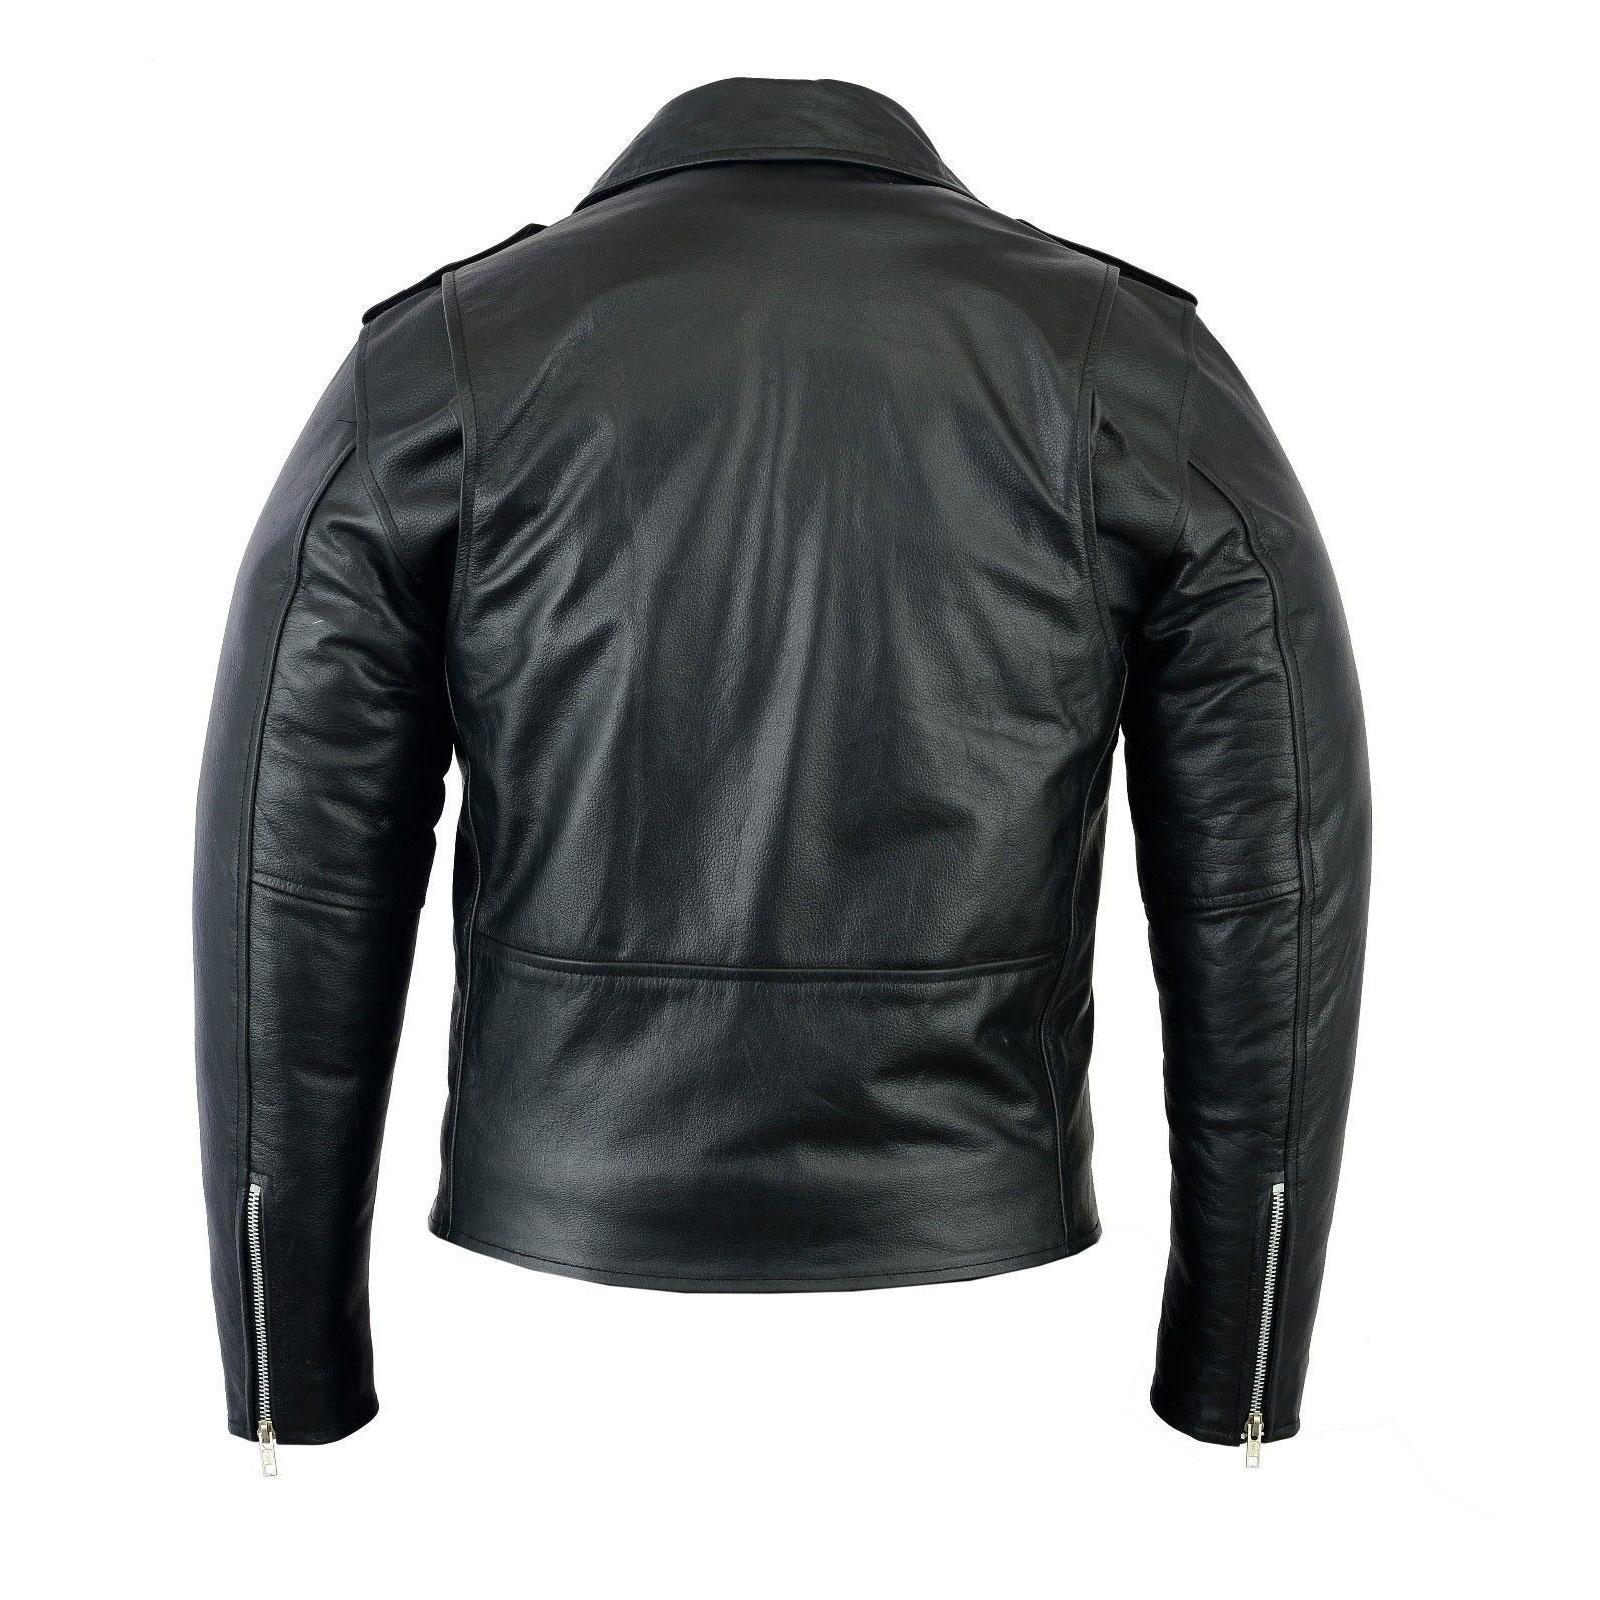 Brando Vintage Motorcycle Black Leather Jacket